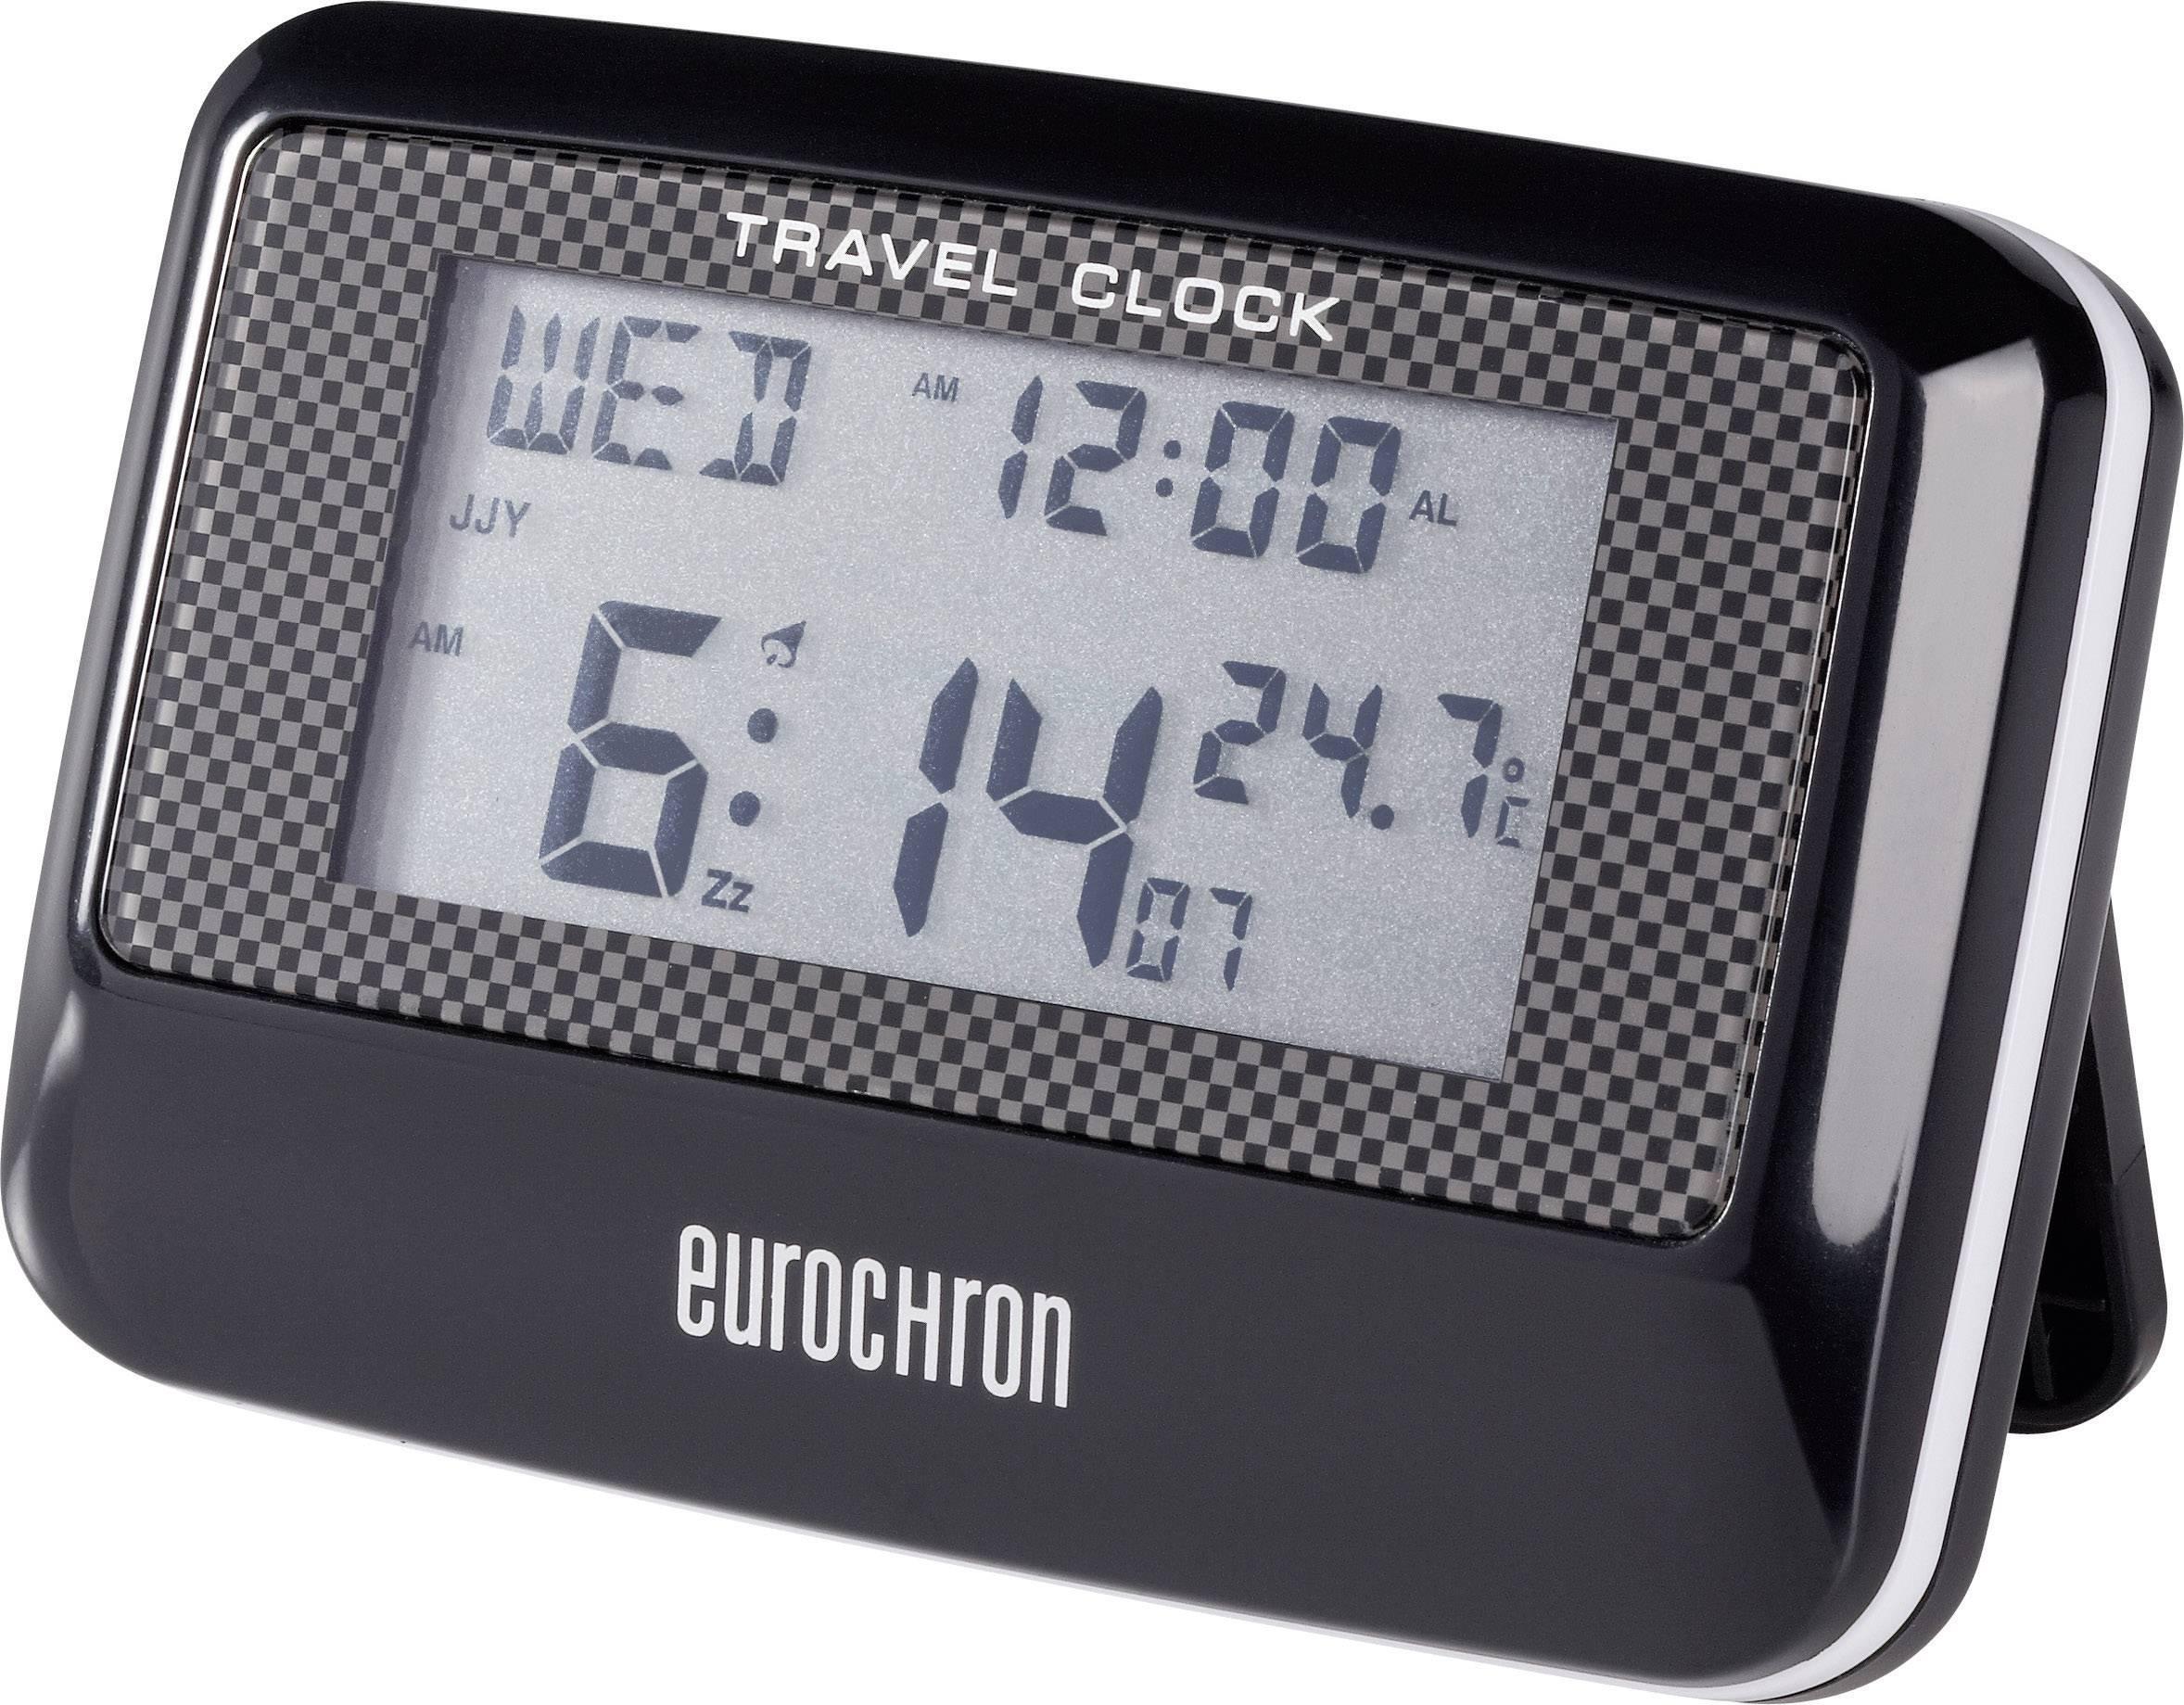 Cestovný DCF budík Eurochron Multiband EFW 200 T